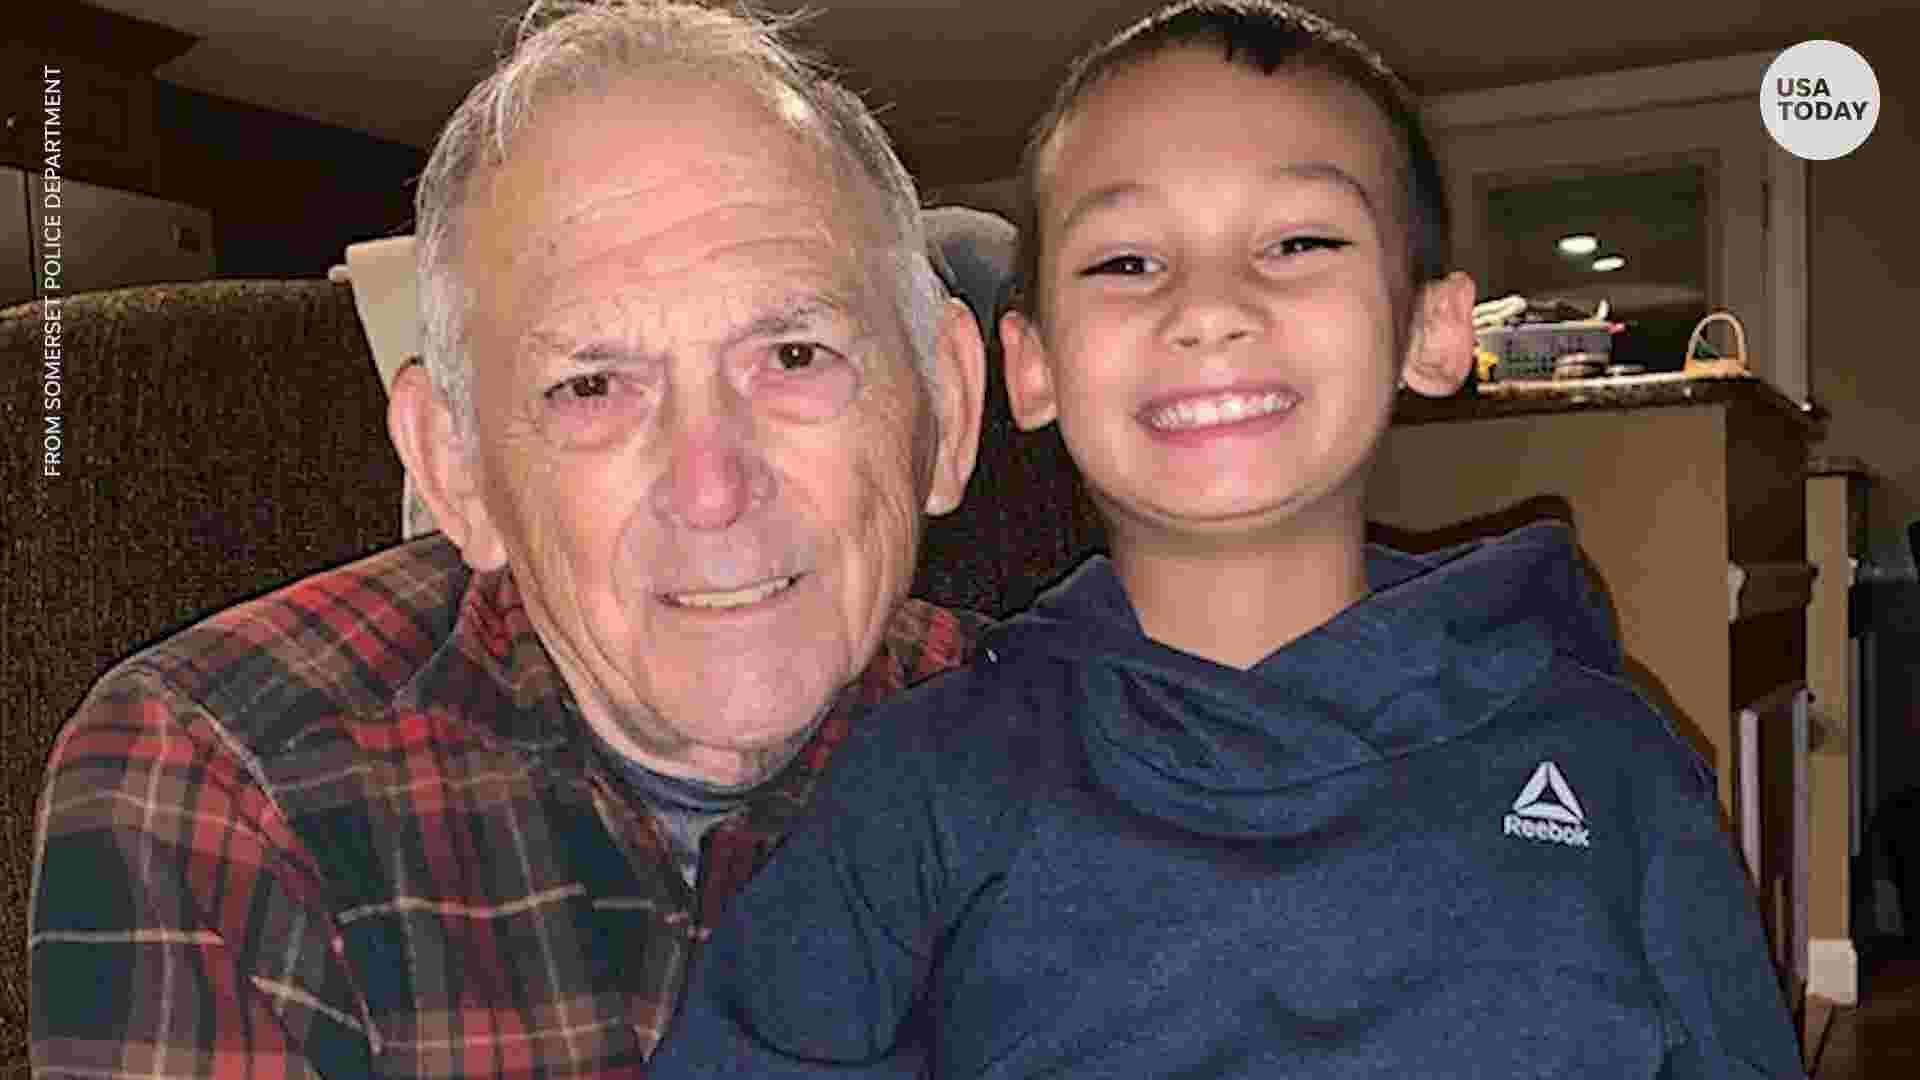 Massachusetts Hero Boy Called 911 Saved Grandpas Life Police Say